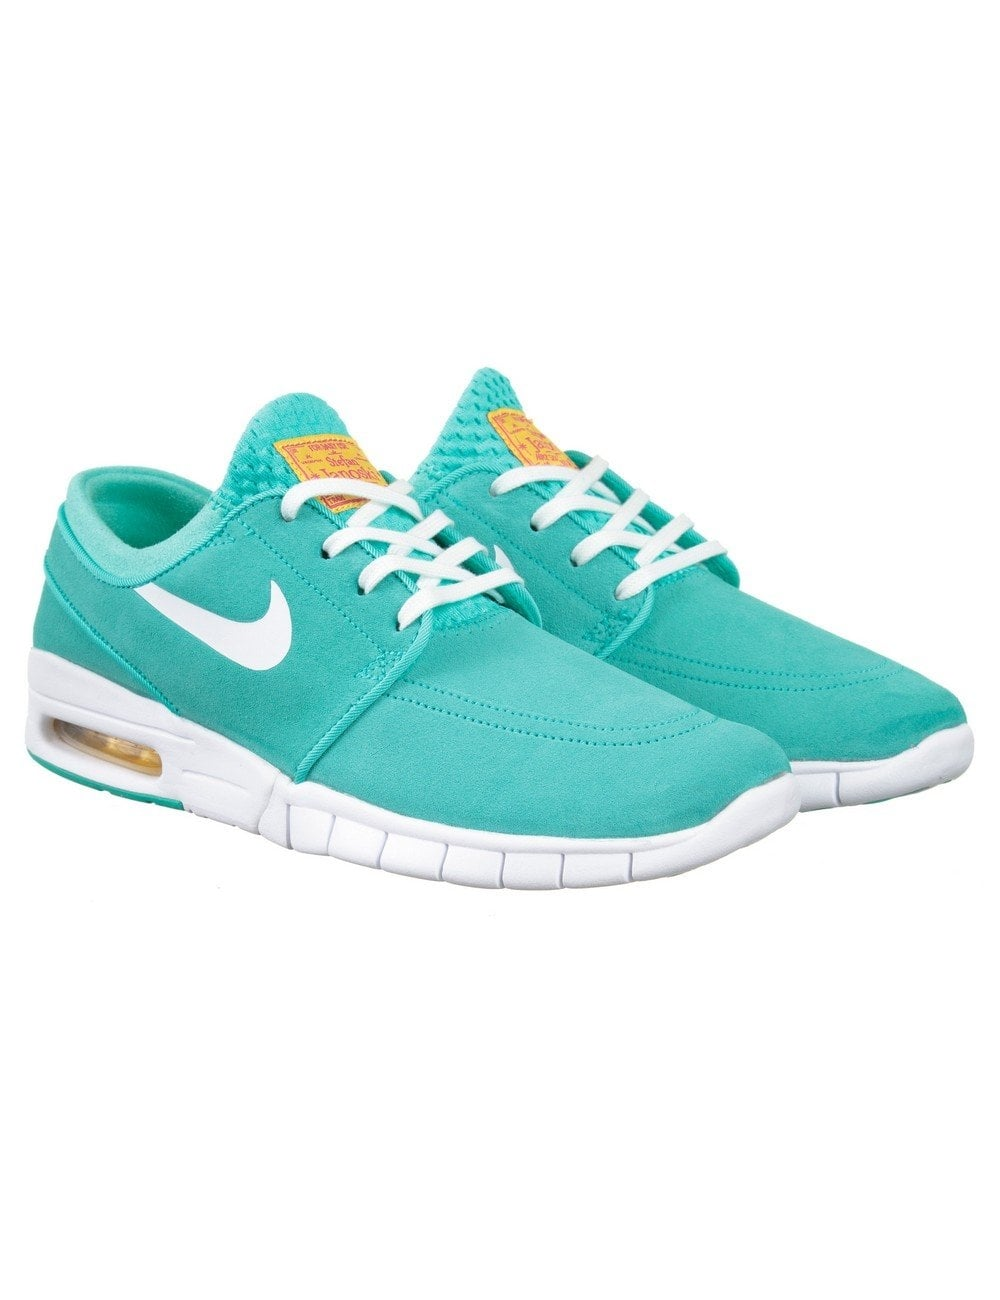 ed95f5cfc2 Nike SB Stefan Janoski Max L Shoes - Hyper Jade/White - Footwear ...